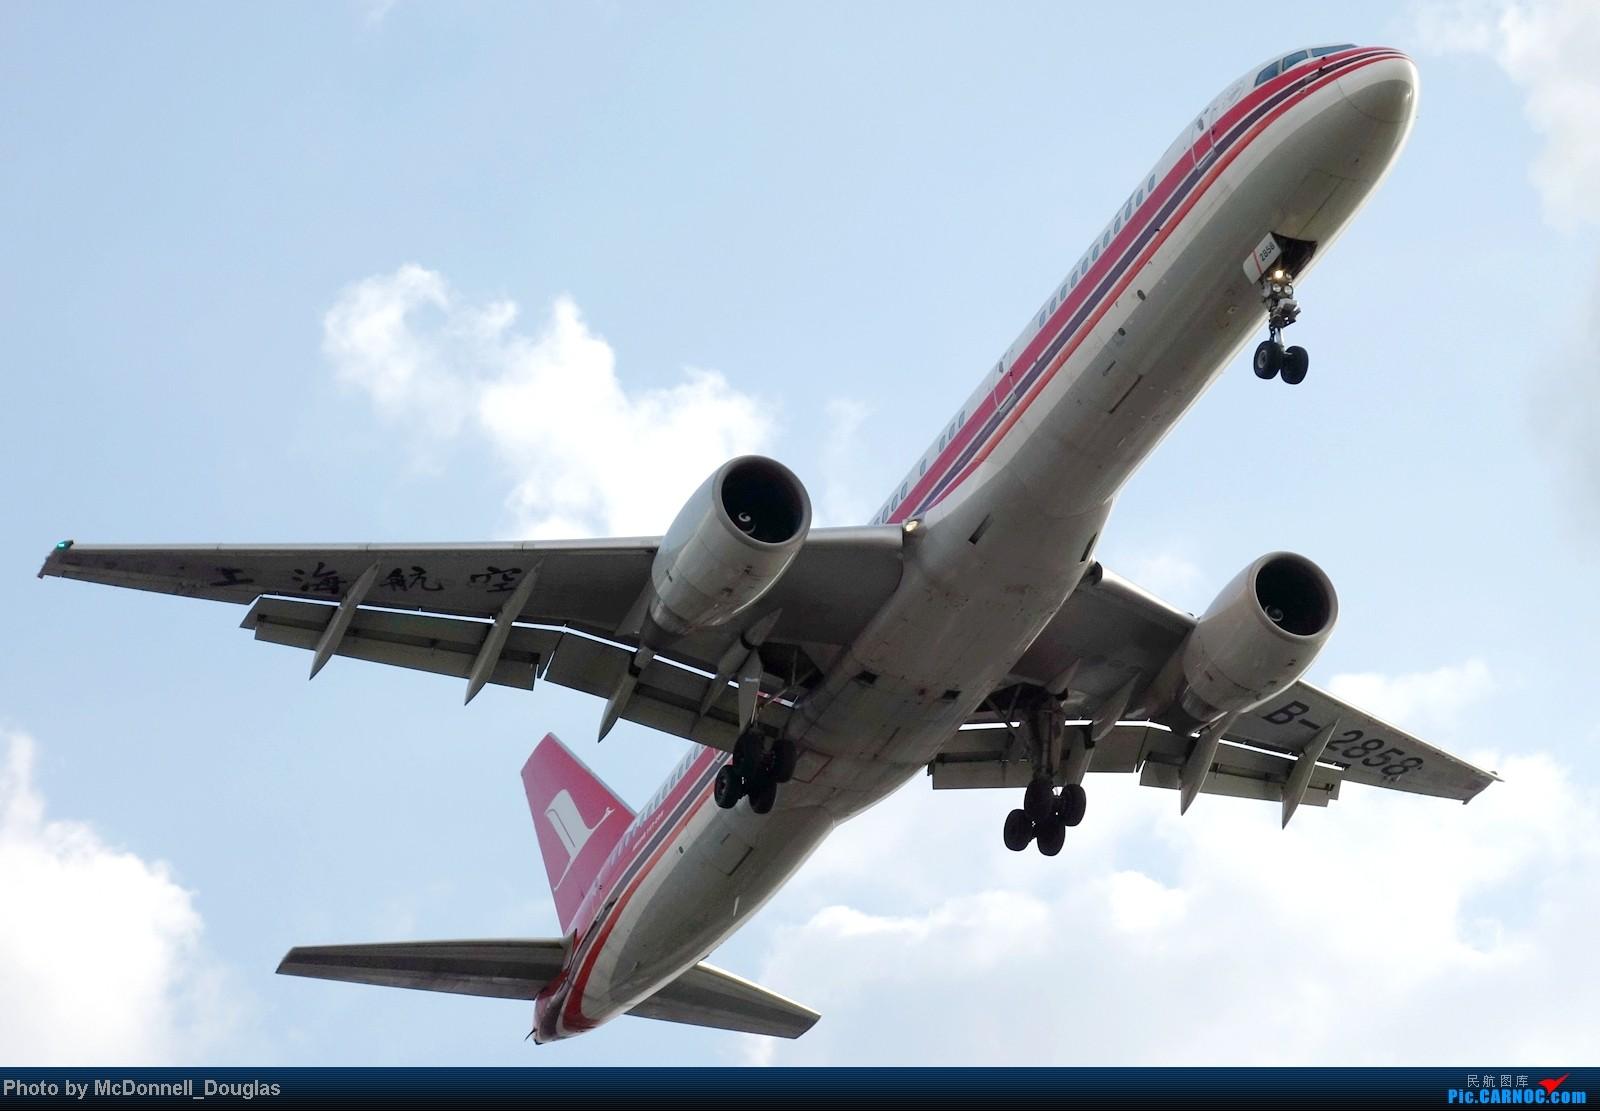 Re:[原创]【上海飞友会】ZSSS杂图一组 BOEING 757-200 B-2858 中国上海虹桥机场